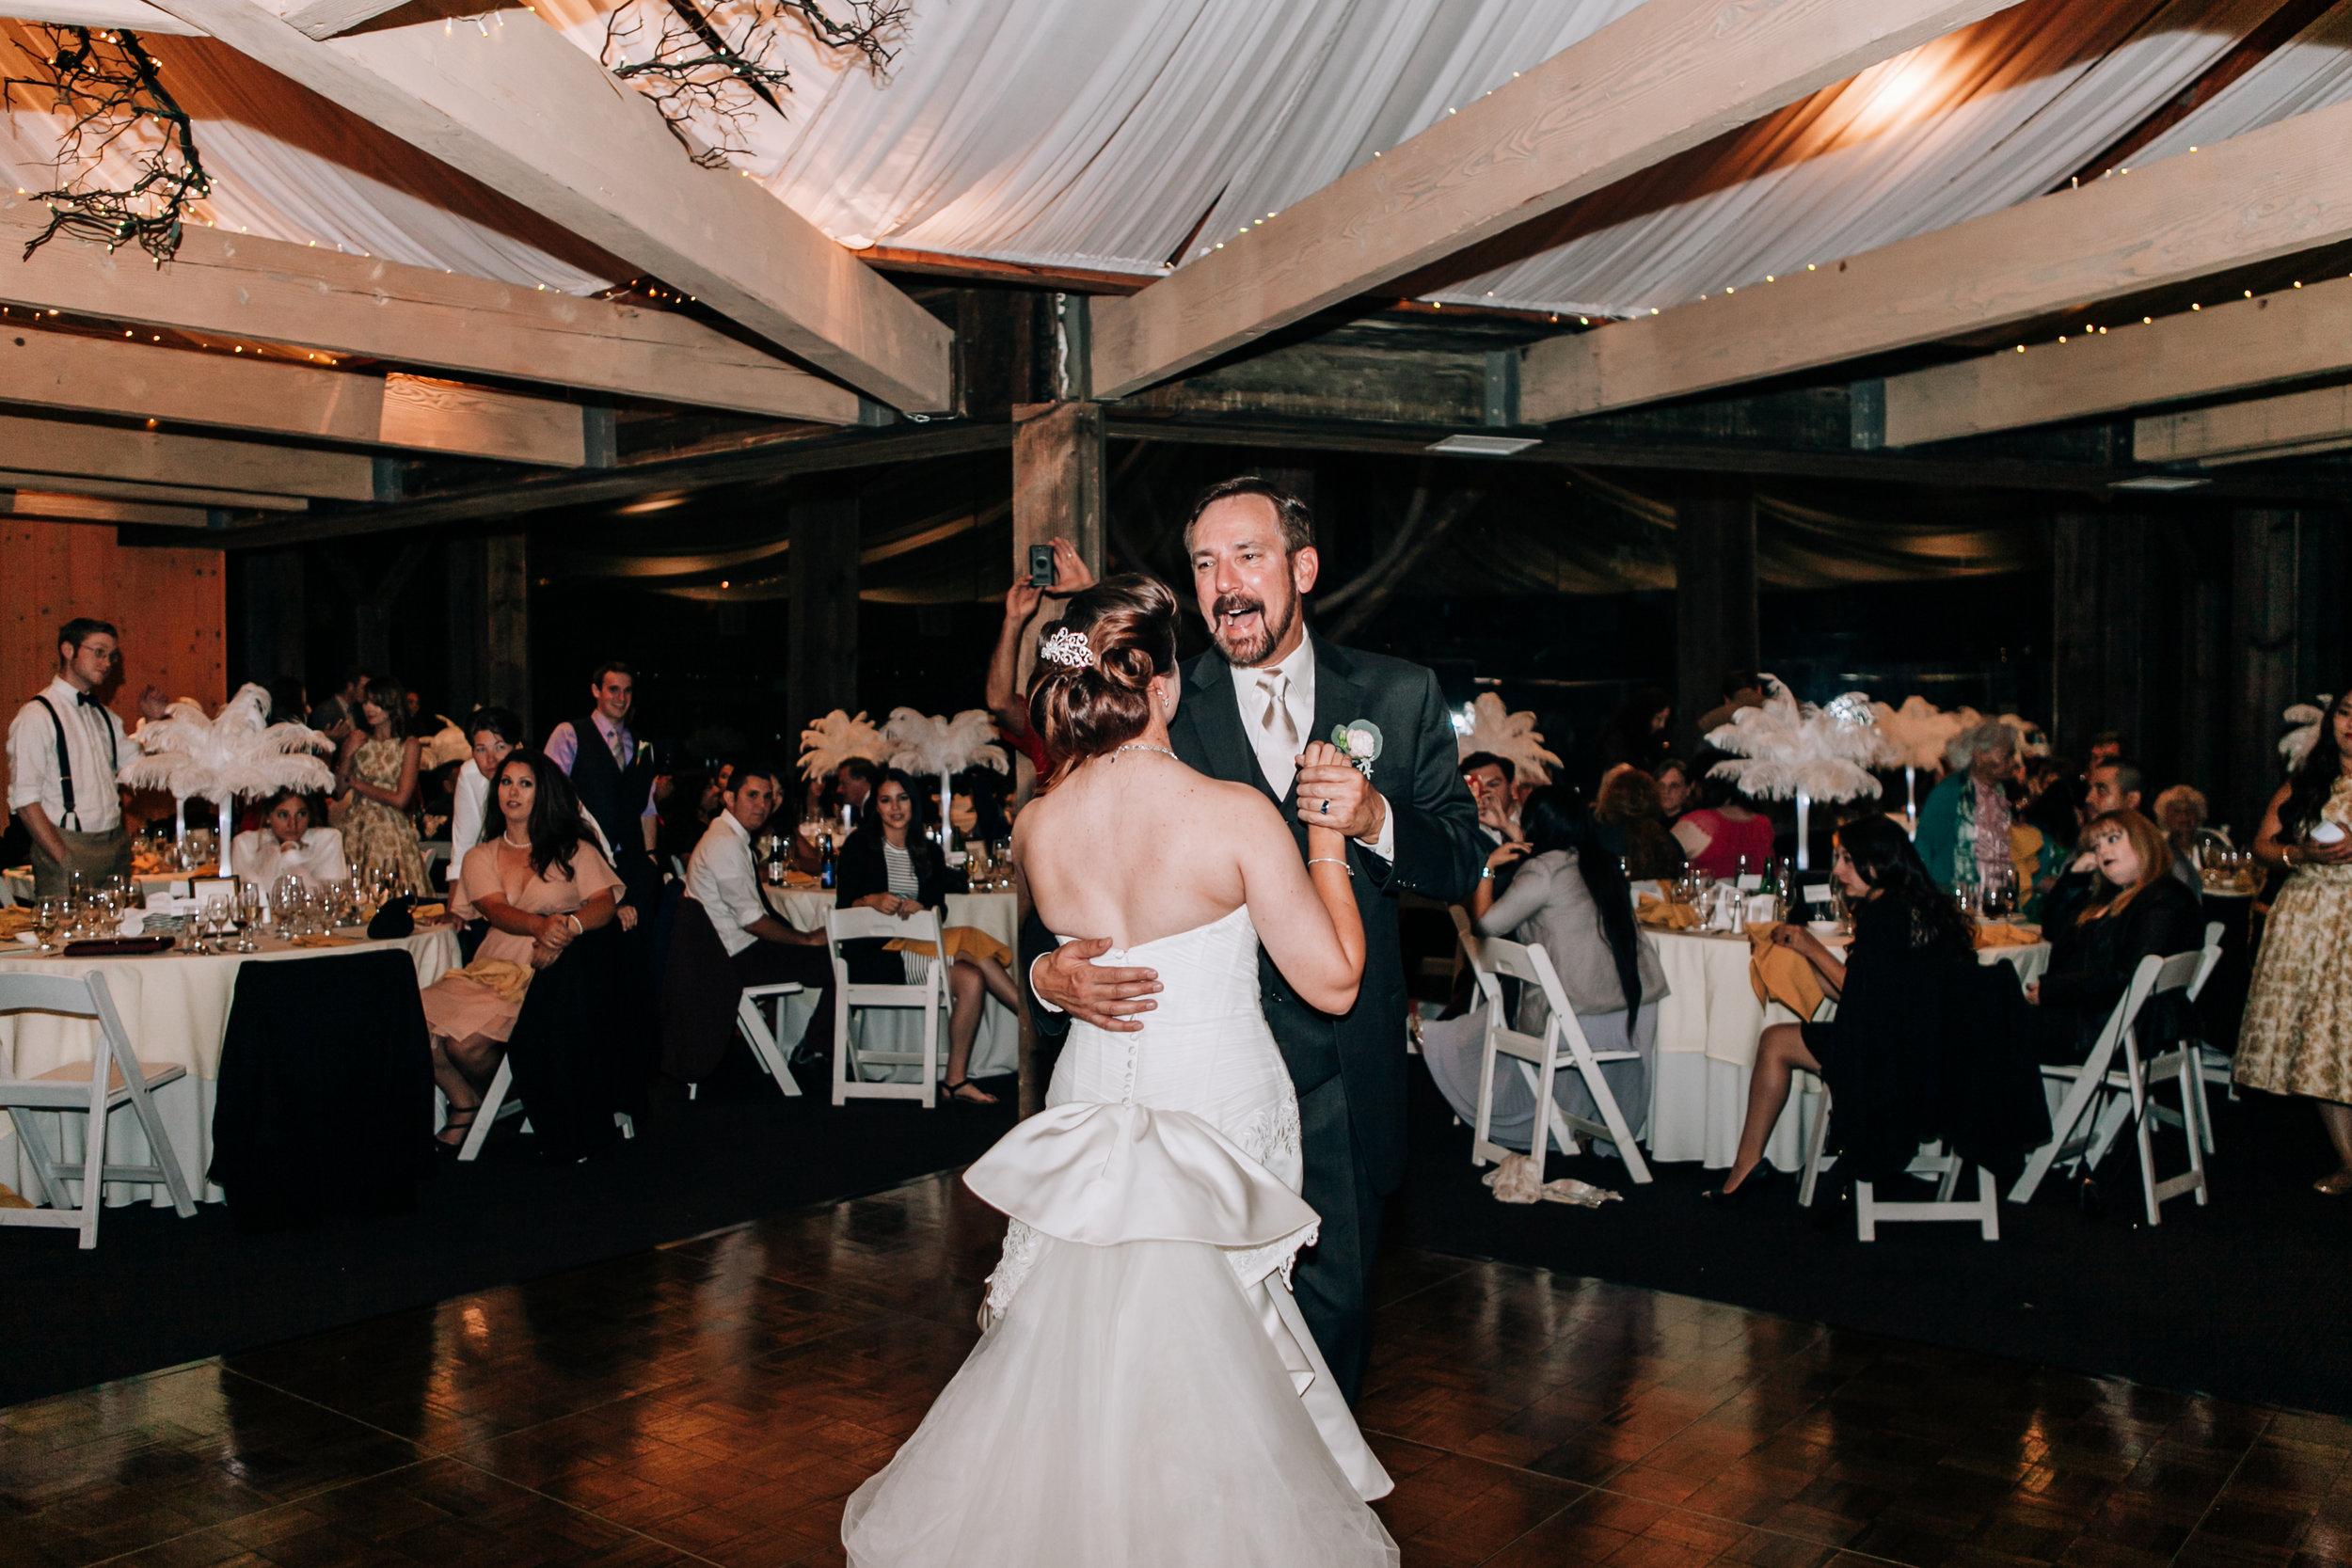 KaraNixonWeddings-Malibu-Wedding-66.jpg